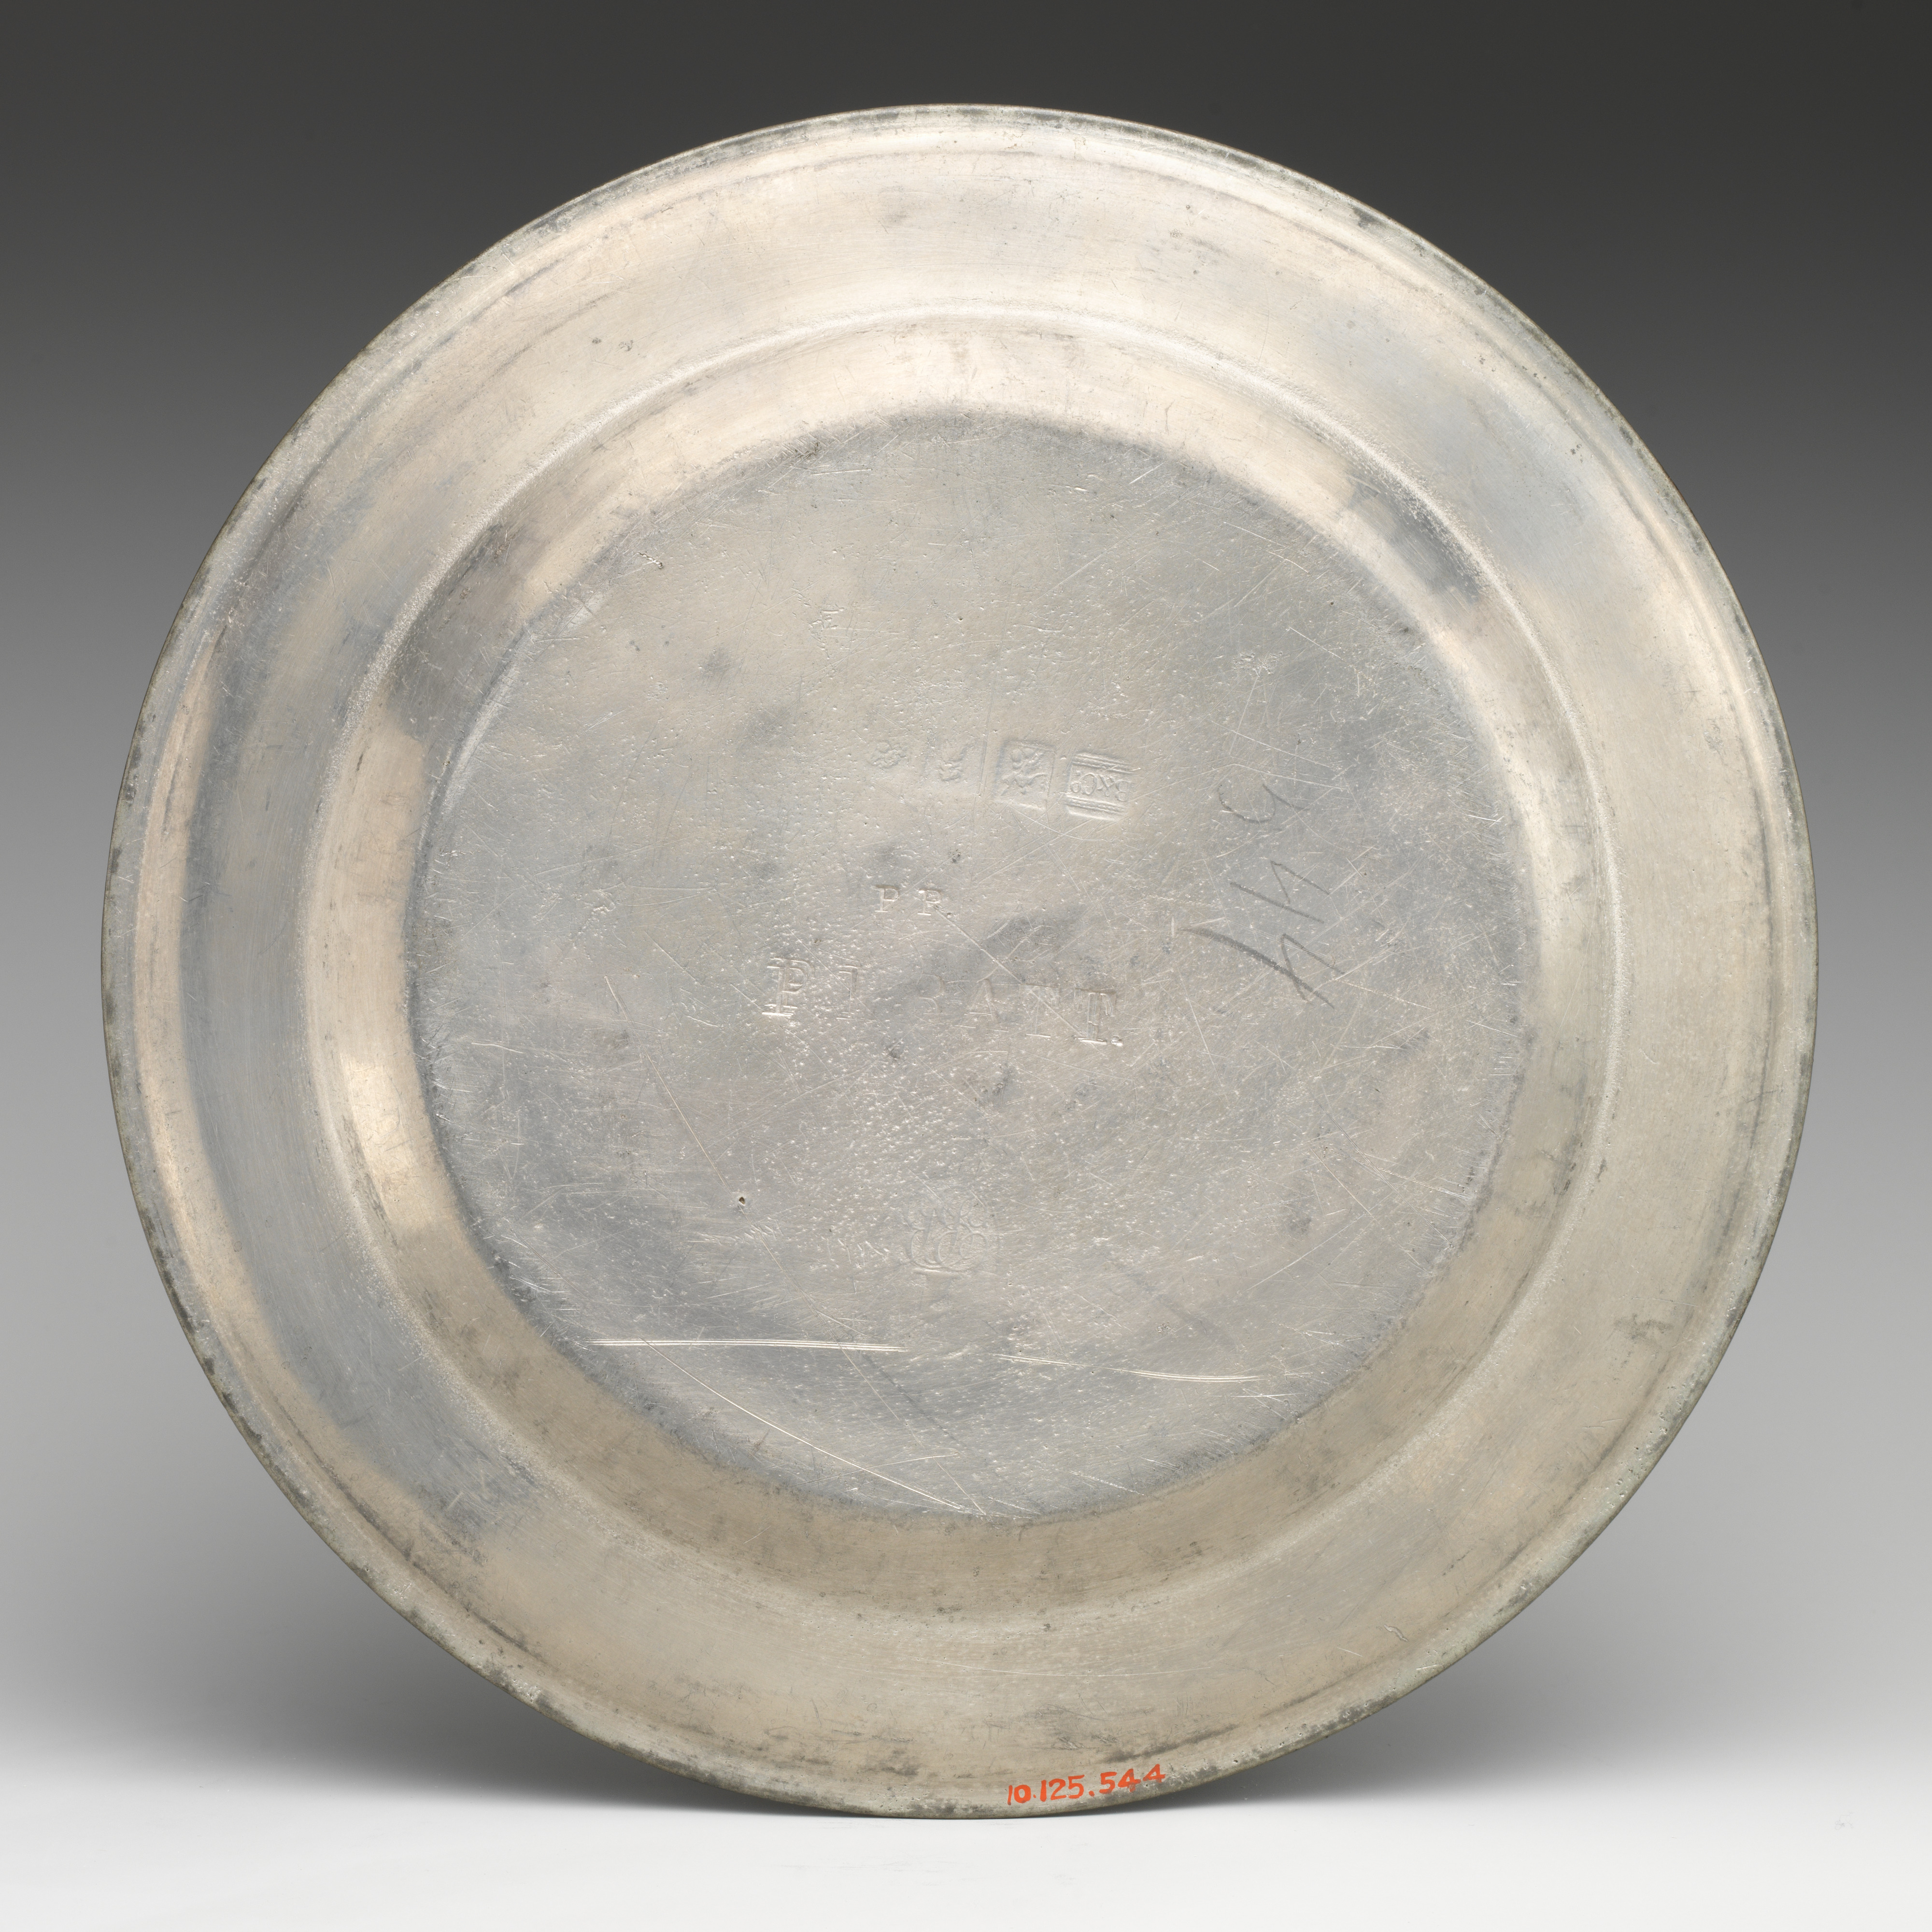 Details about  /Decorative plate from 30x24cm show original title